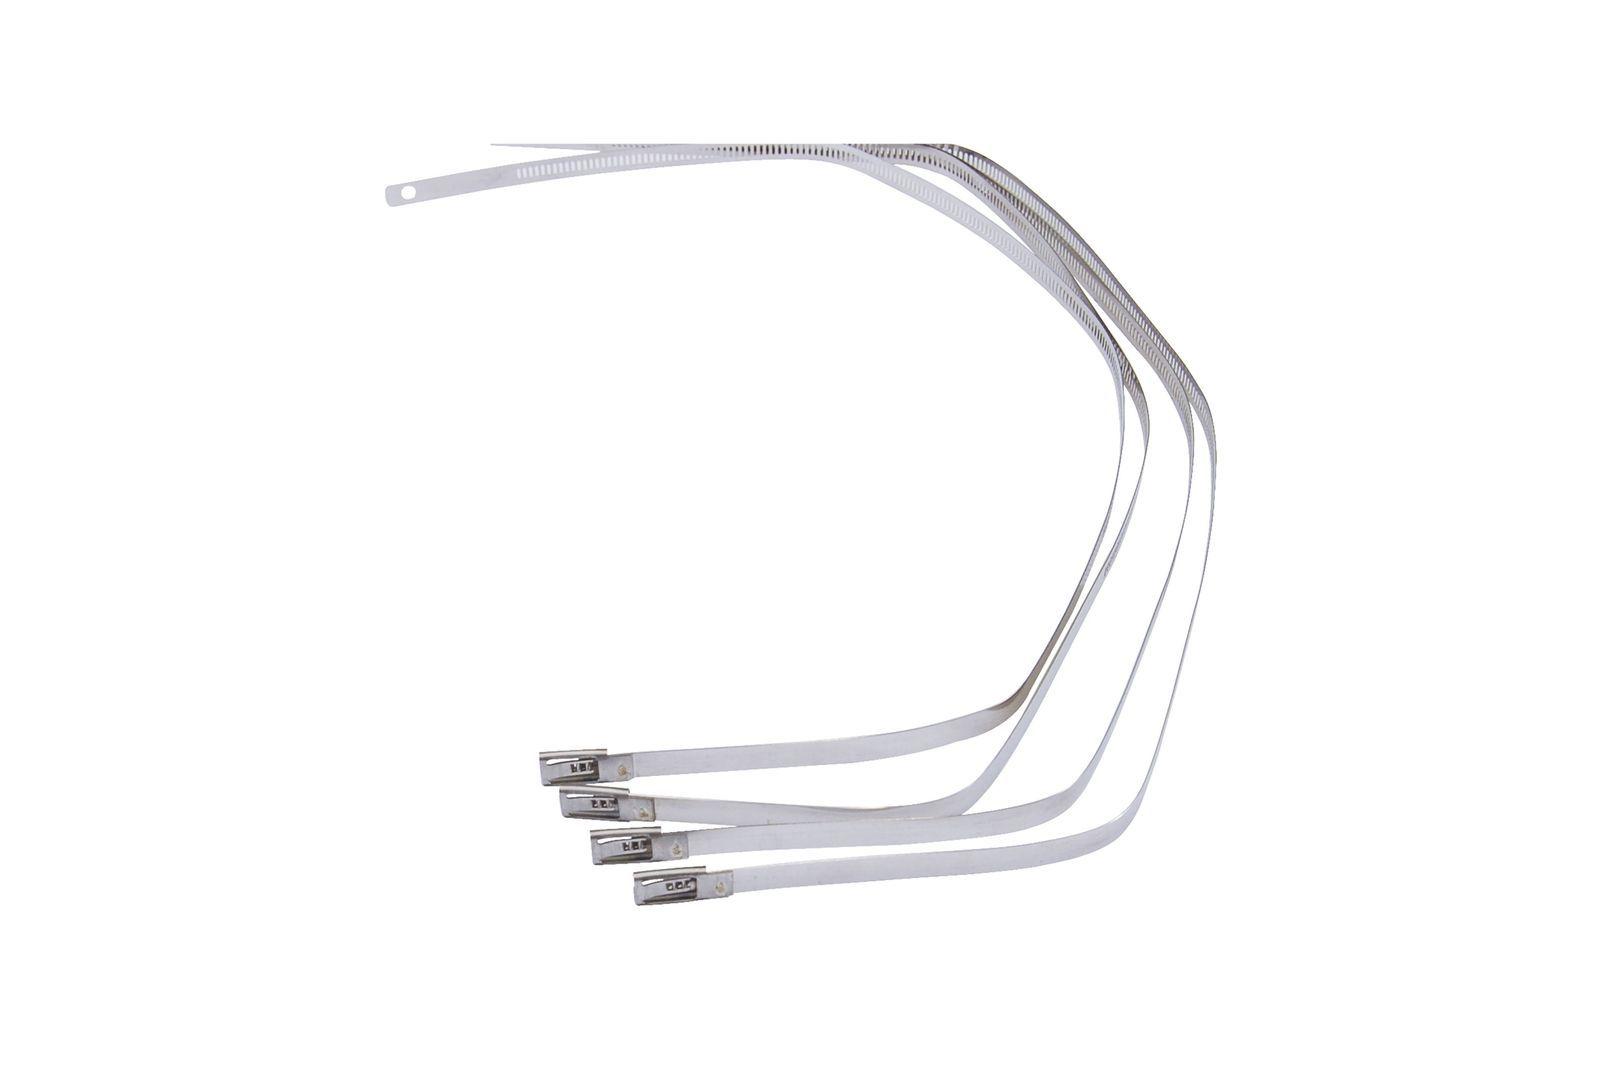 #Edelstahl Kabelbinder-Satz 12x 20,32 cm, GAC0174